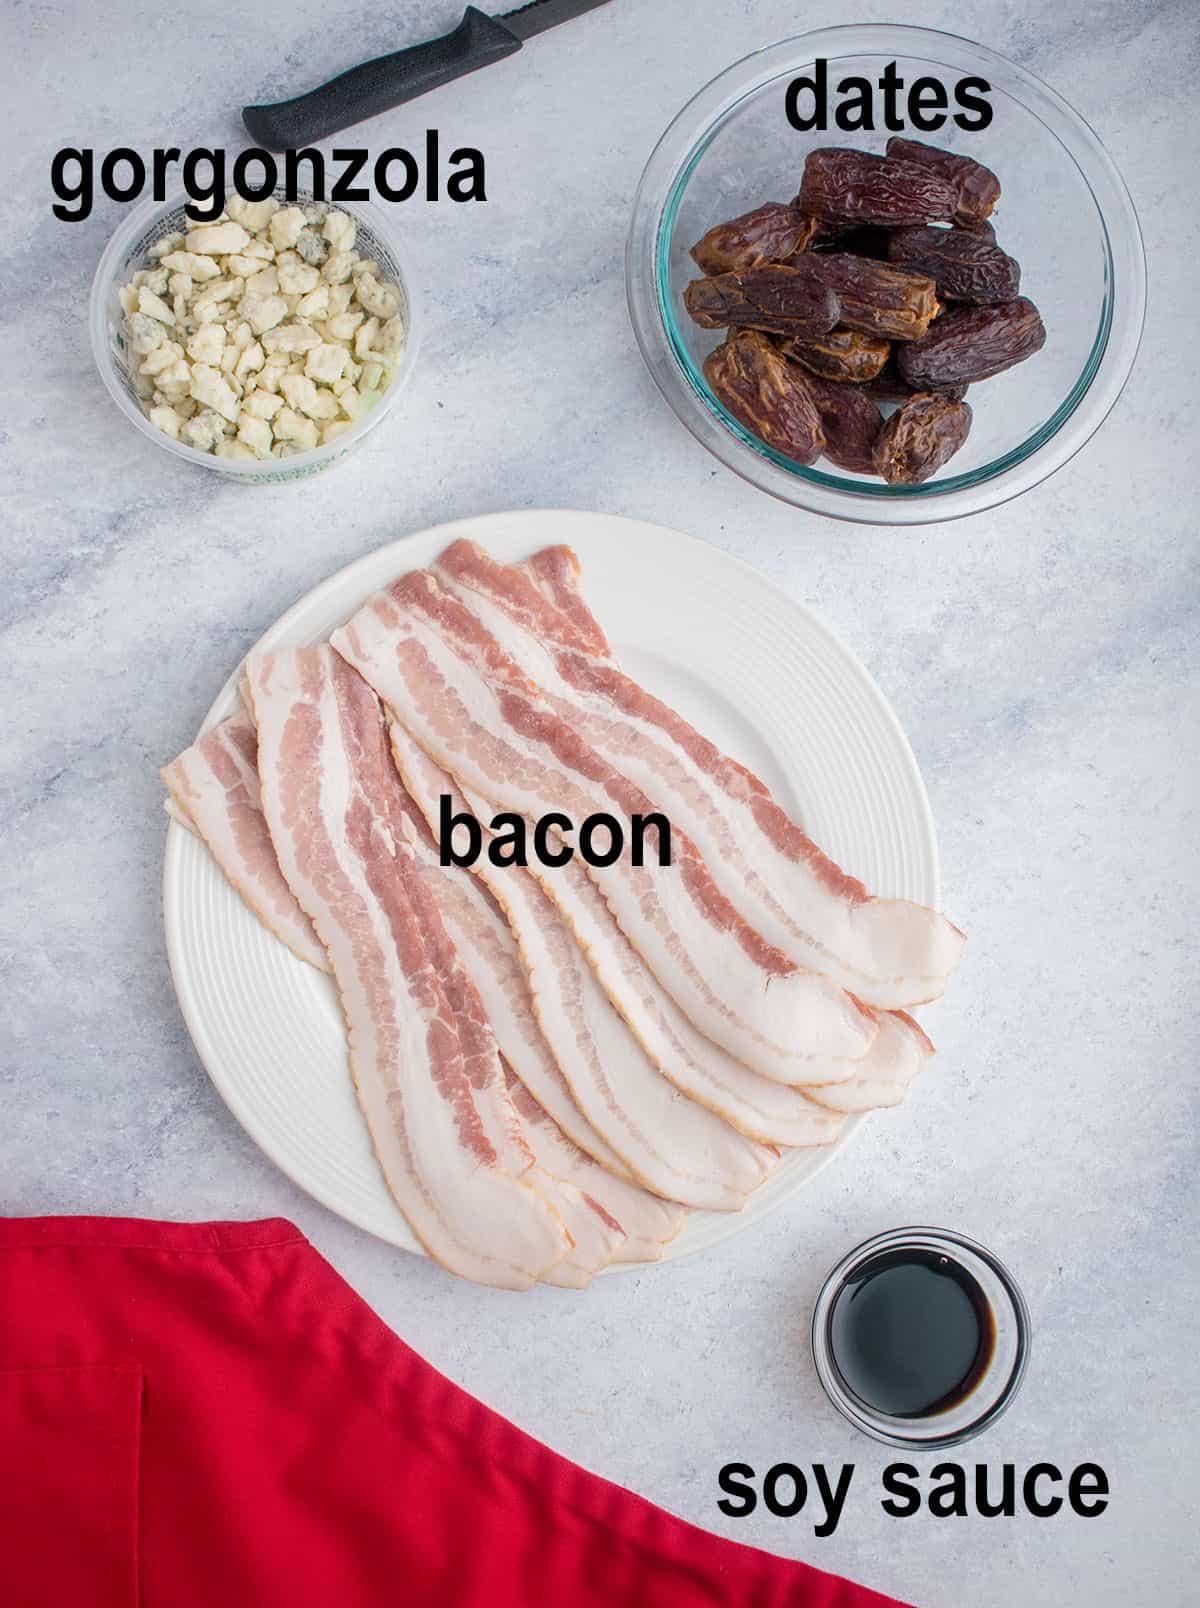 gorgonzola, dates, bacon, soy sauce